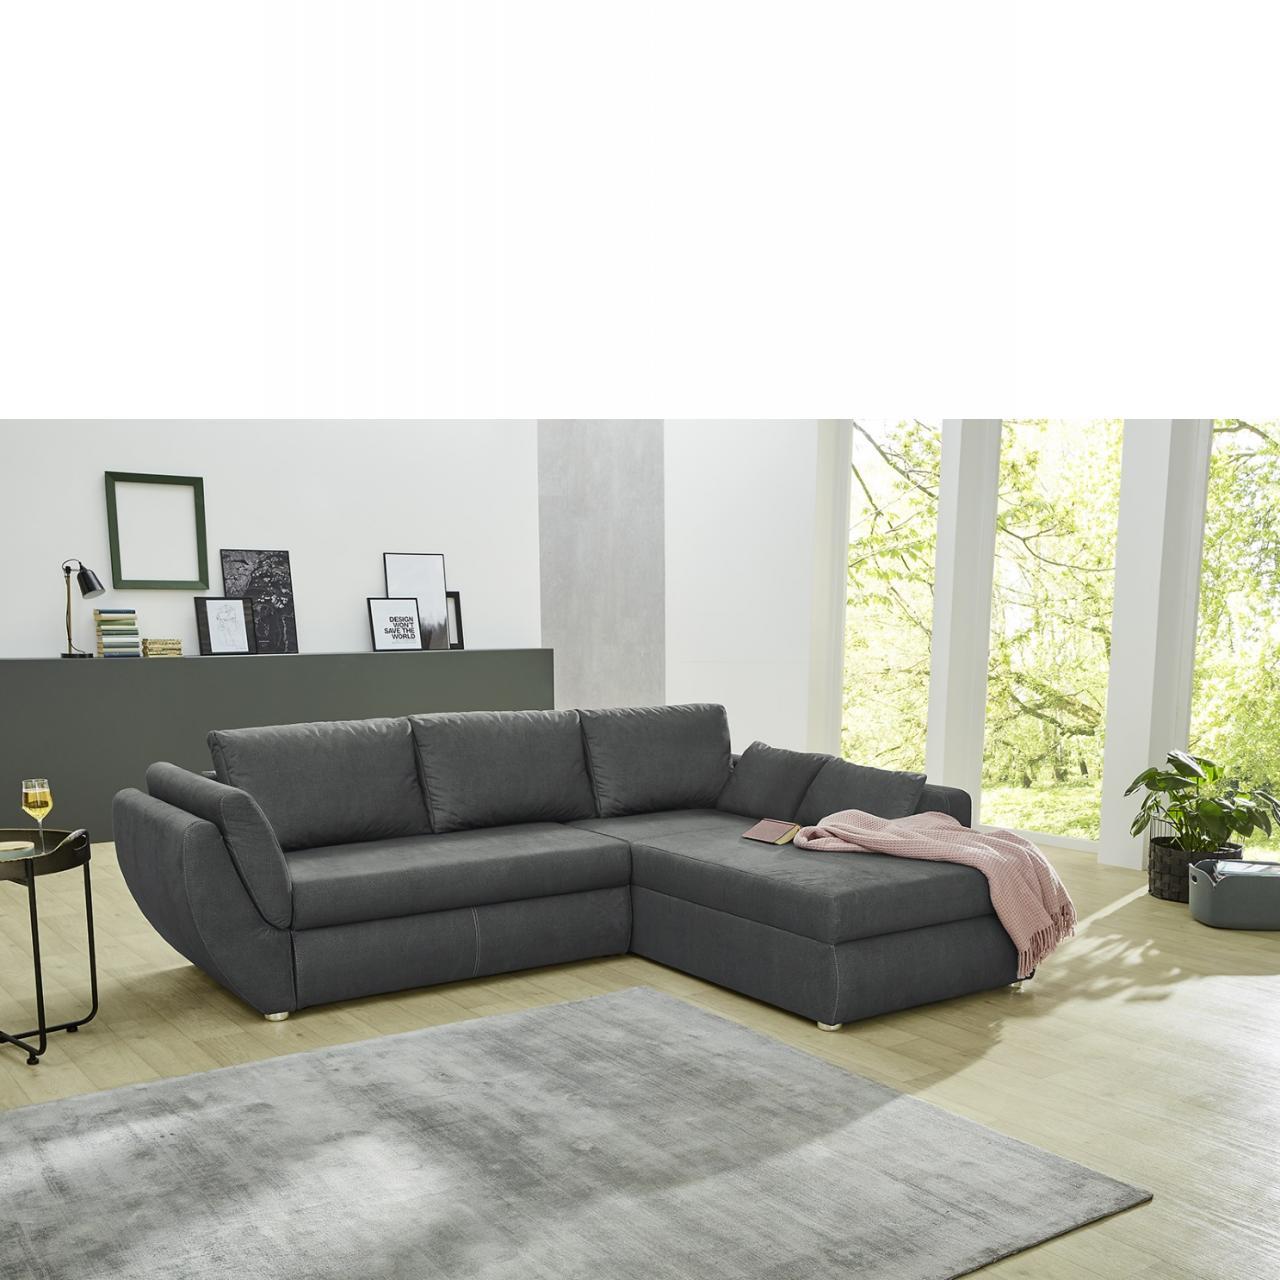 wohnlandschaft taifun wohnlandschaft polsterm bel. Black Bedroom Furniture Sets. Home Design Ideas